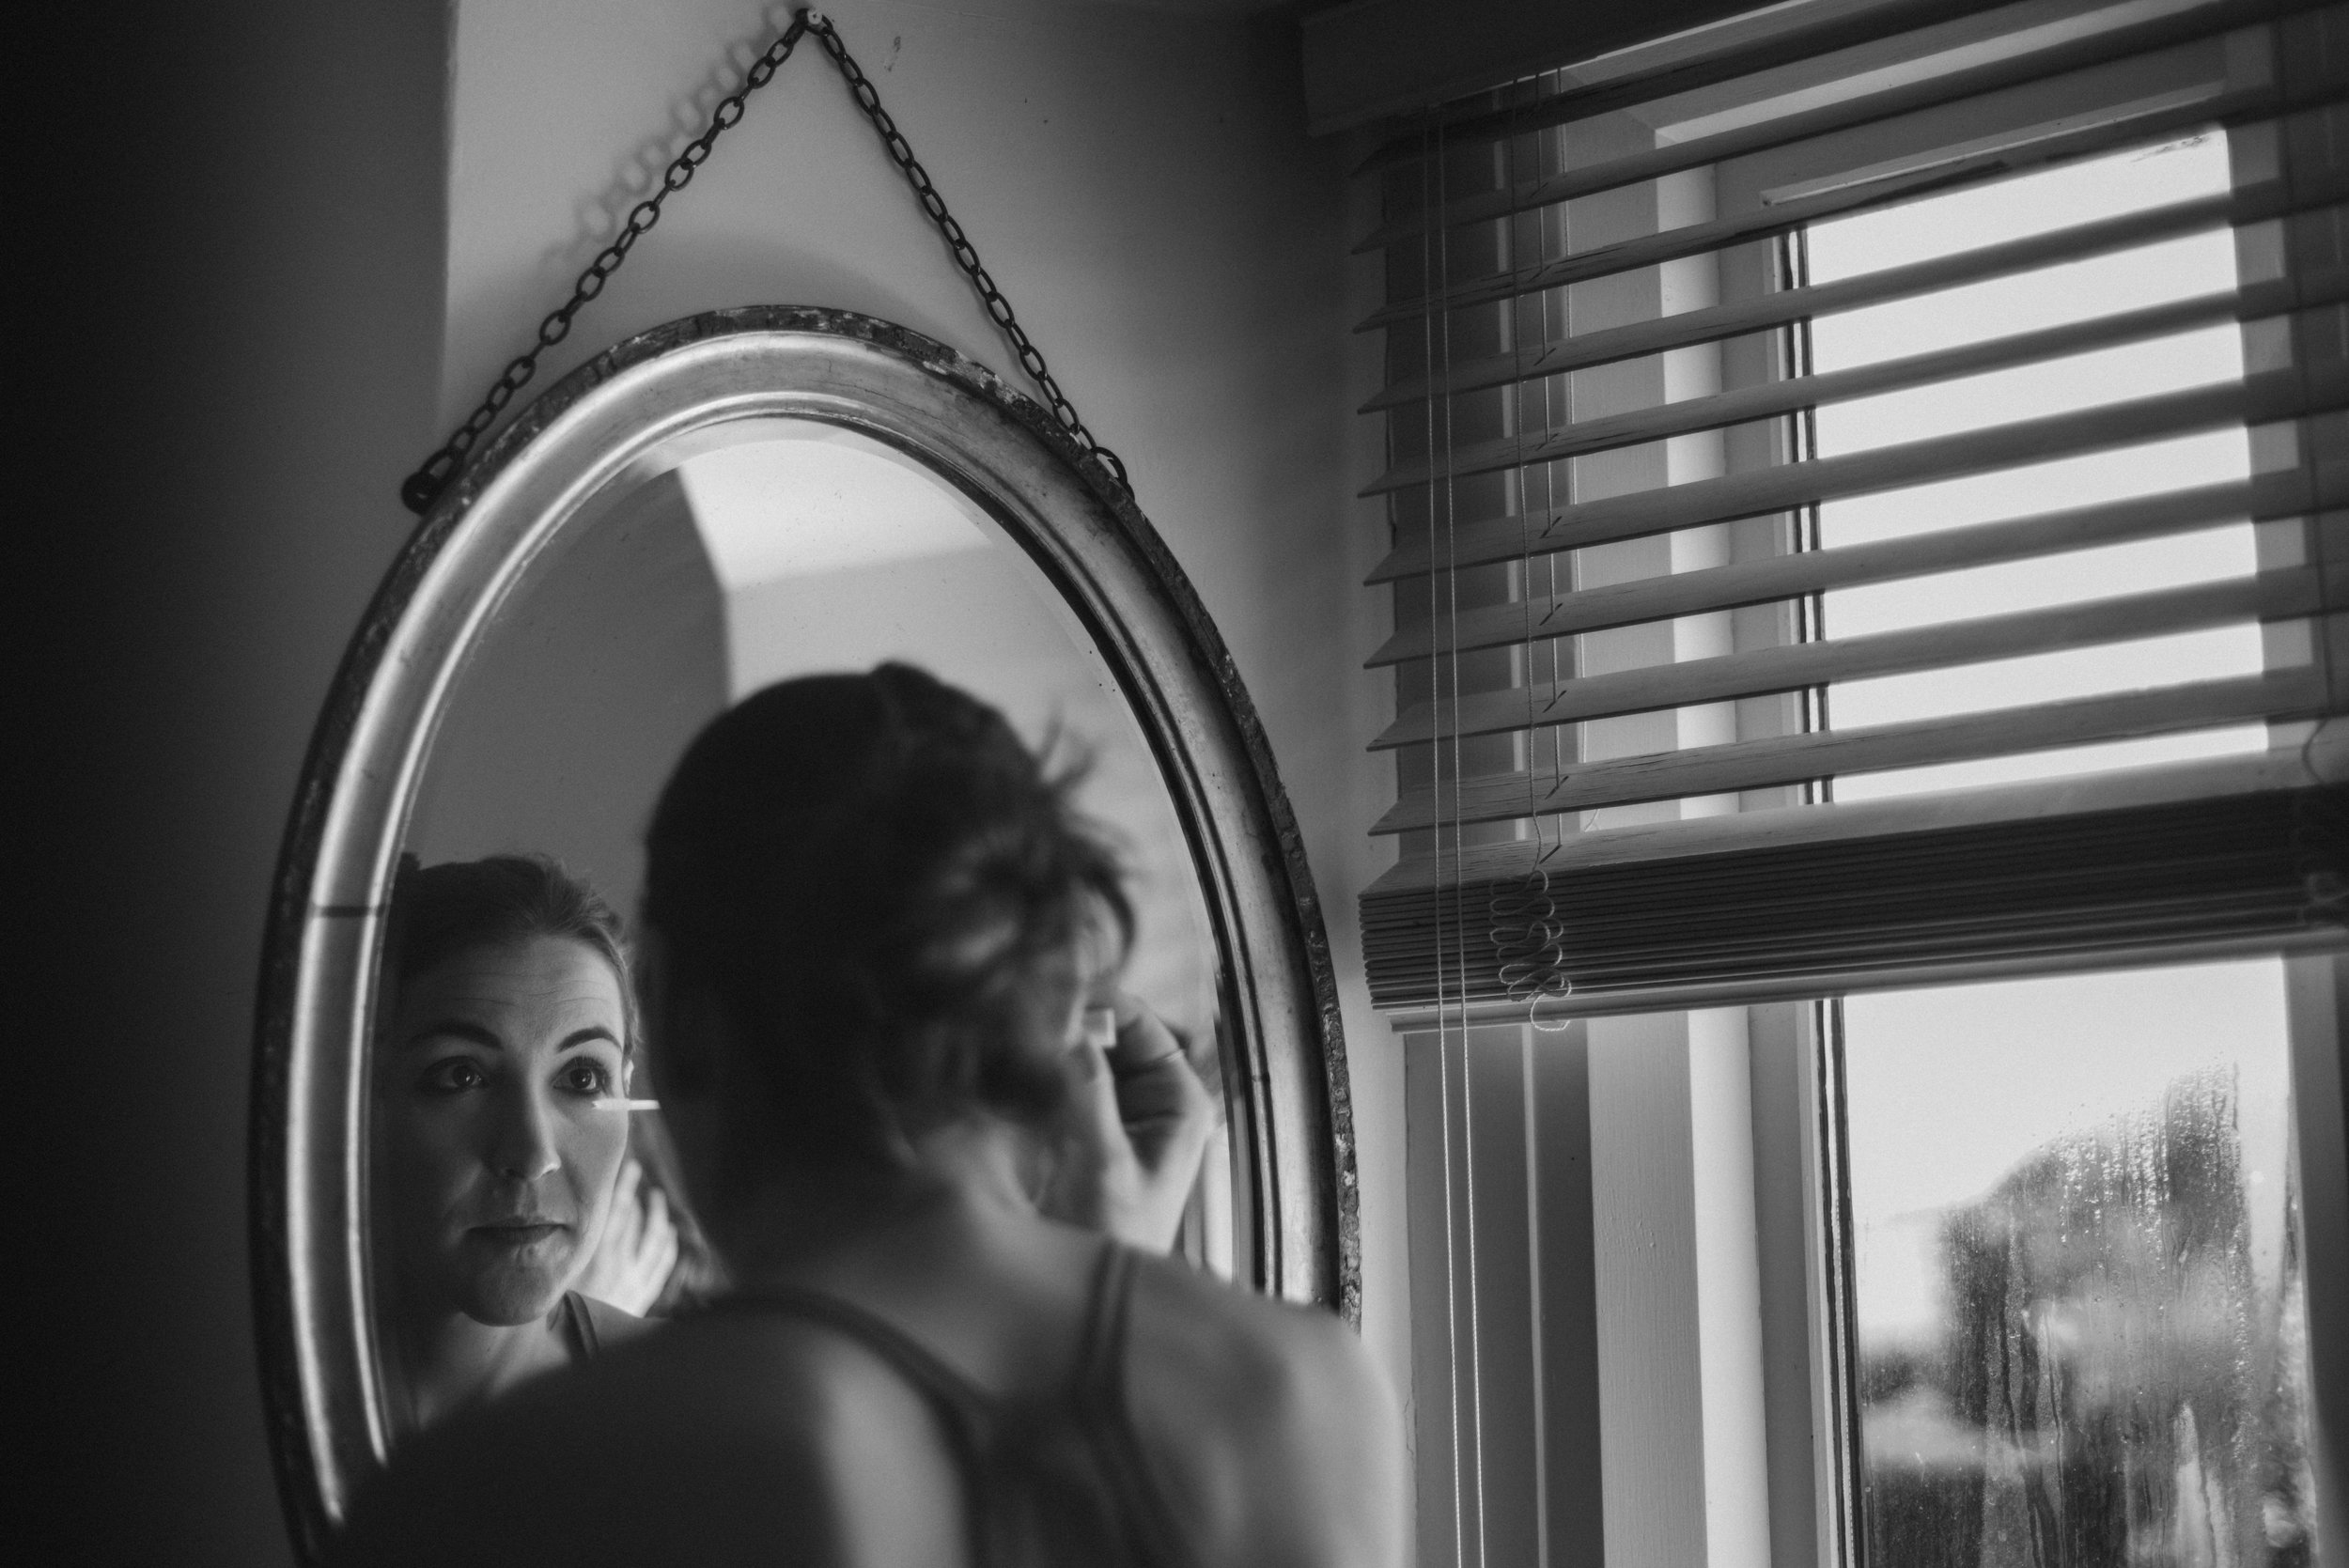 ash-barton-estate-wedding-photographer-mark-shaw-8.jpg